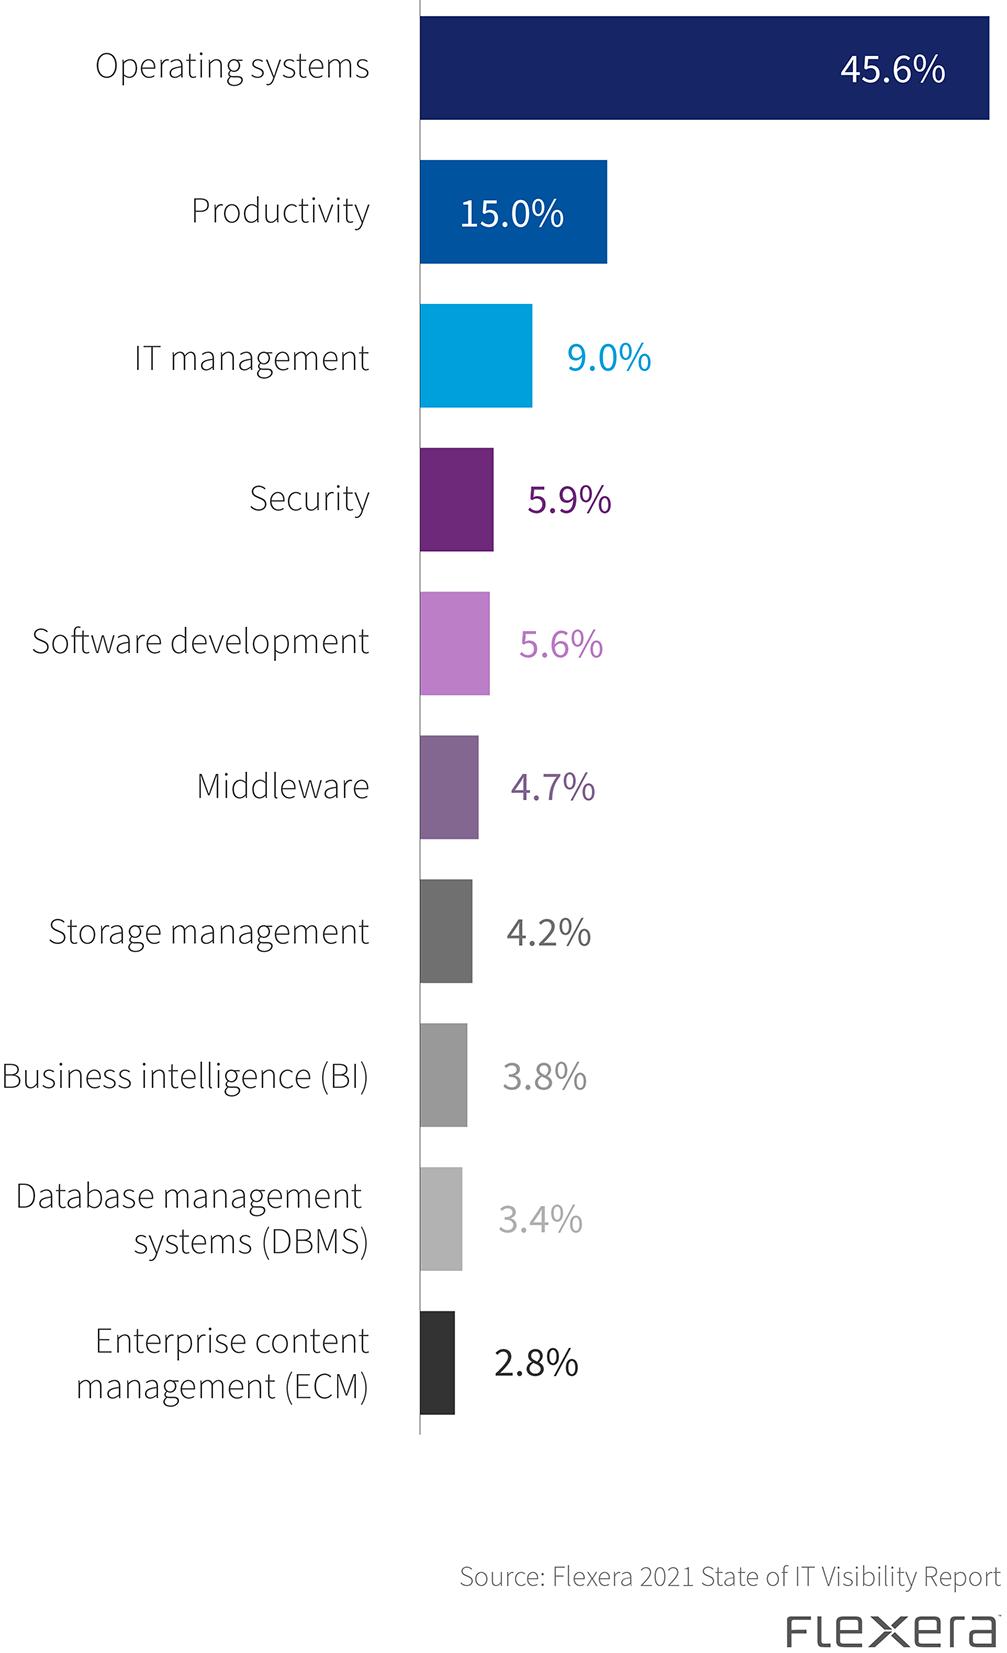 Ten most vulnerable categories by EOL/EOS